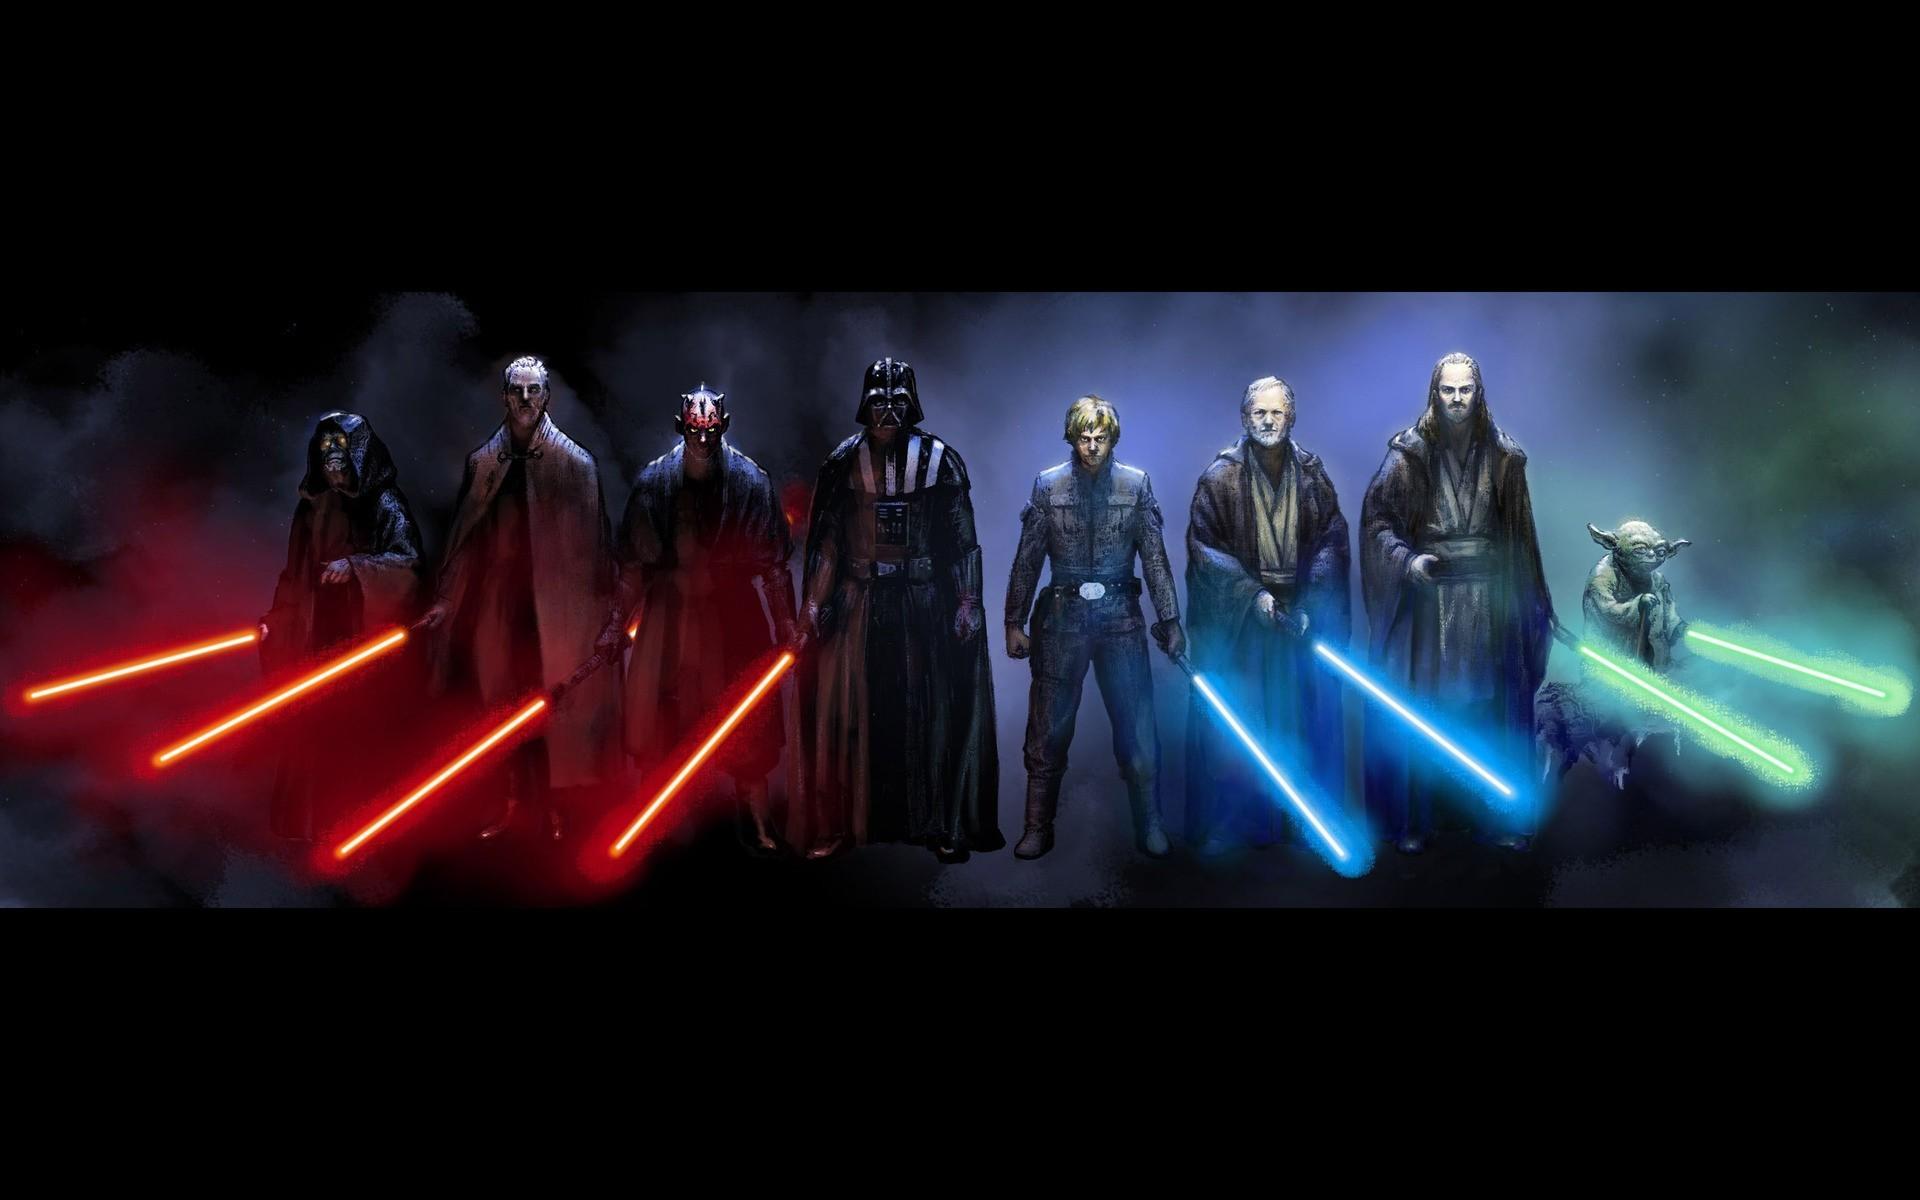 Yoda, Obi Wan Kenobi, Luke Skywalker, Qui Gon Jinn, Darth Vader, Darth Maul,  Darth Sidious, Count Dooku, Star Wars Wallpapers HD / Desktop and Mobile …